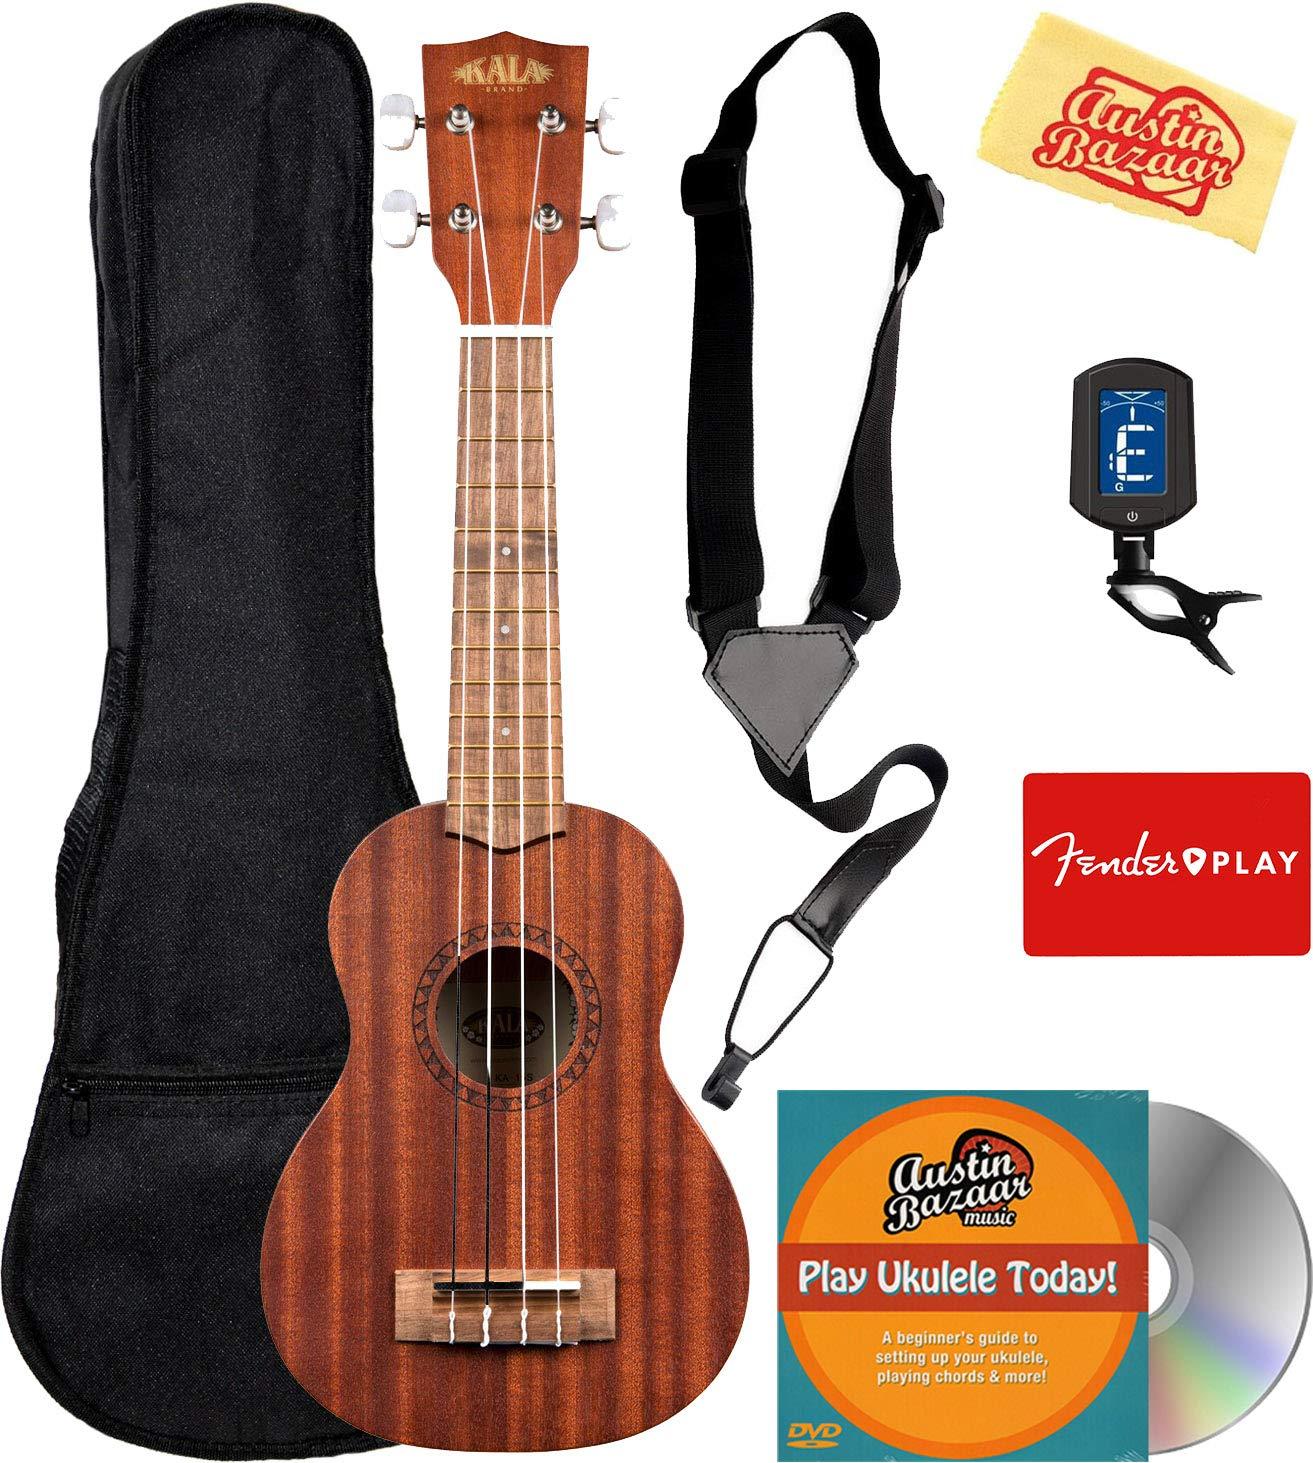 Kala KA-15S Satin Mahogany Soprano Ukulele Bundle with Gig Bag, Tuner, Strap, Fender Play, Austin Bazaar Instructional DVD, and Polishing Cloth by Kala